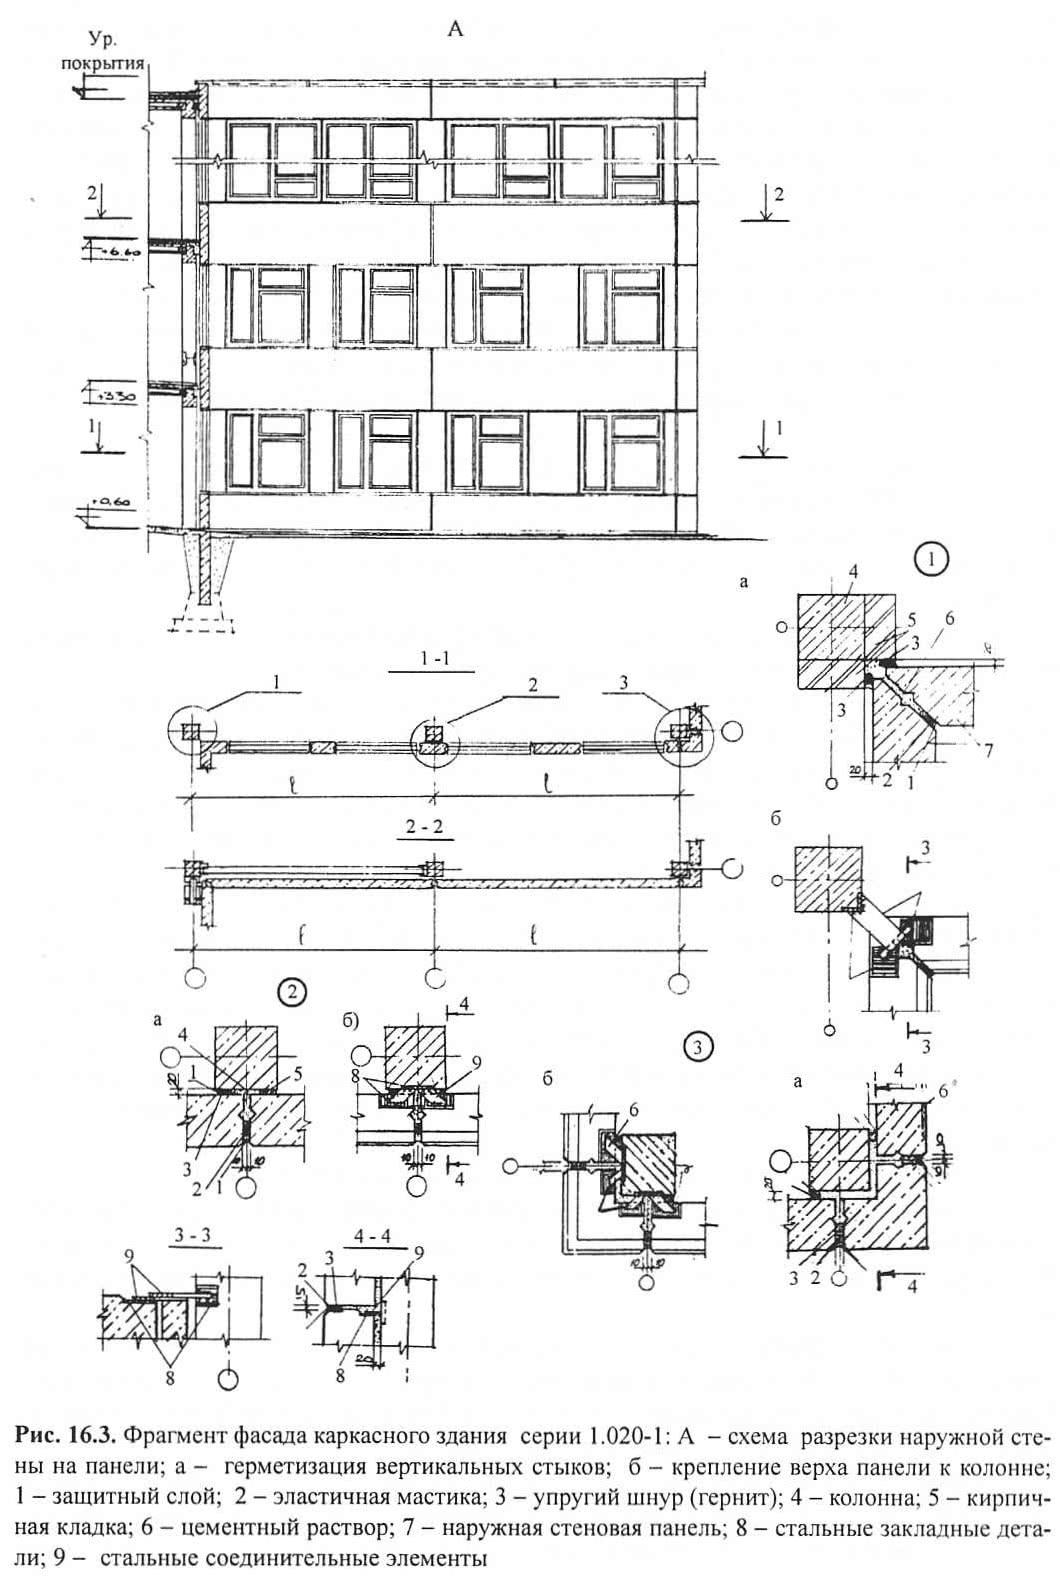 Рис. 16.3. Фрагмент фасада каркасного здания серии 1.020-1